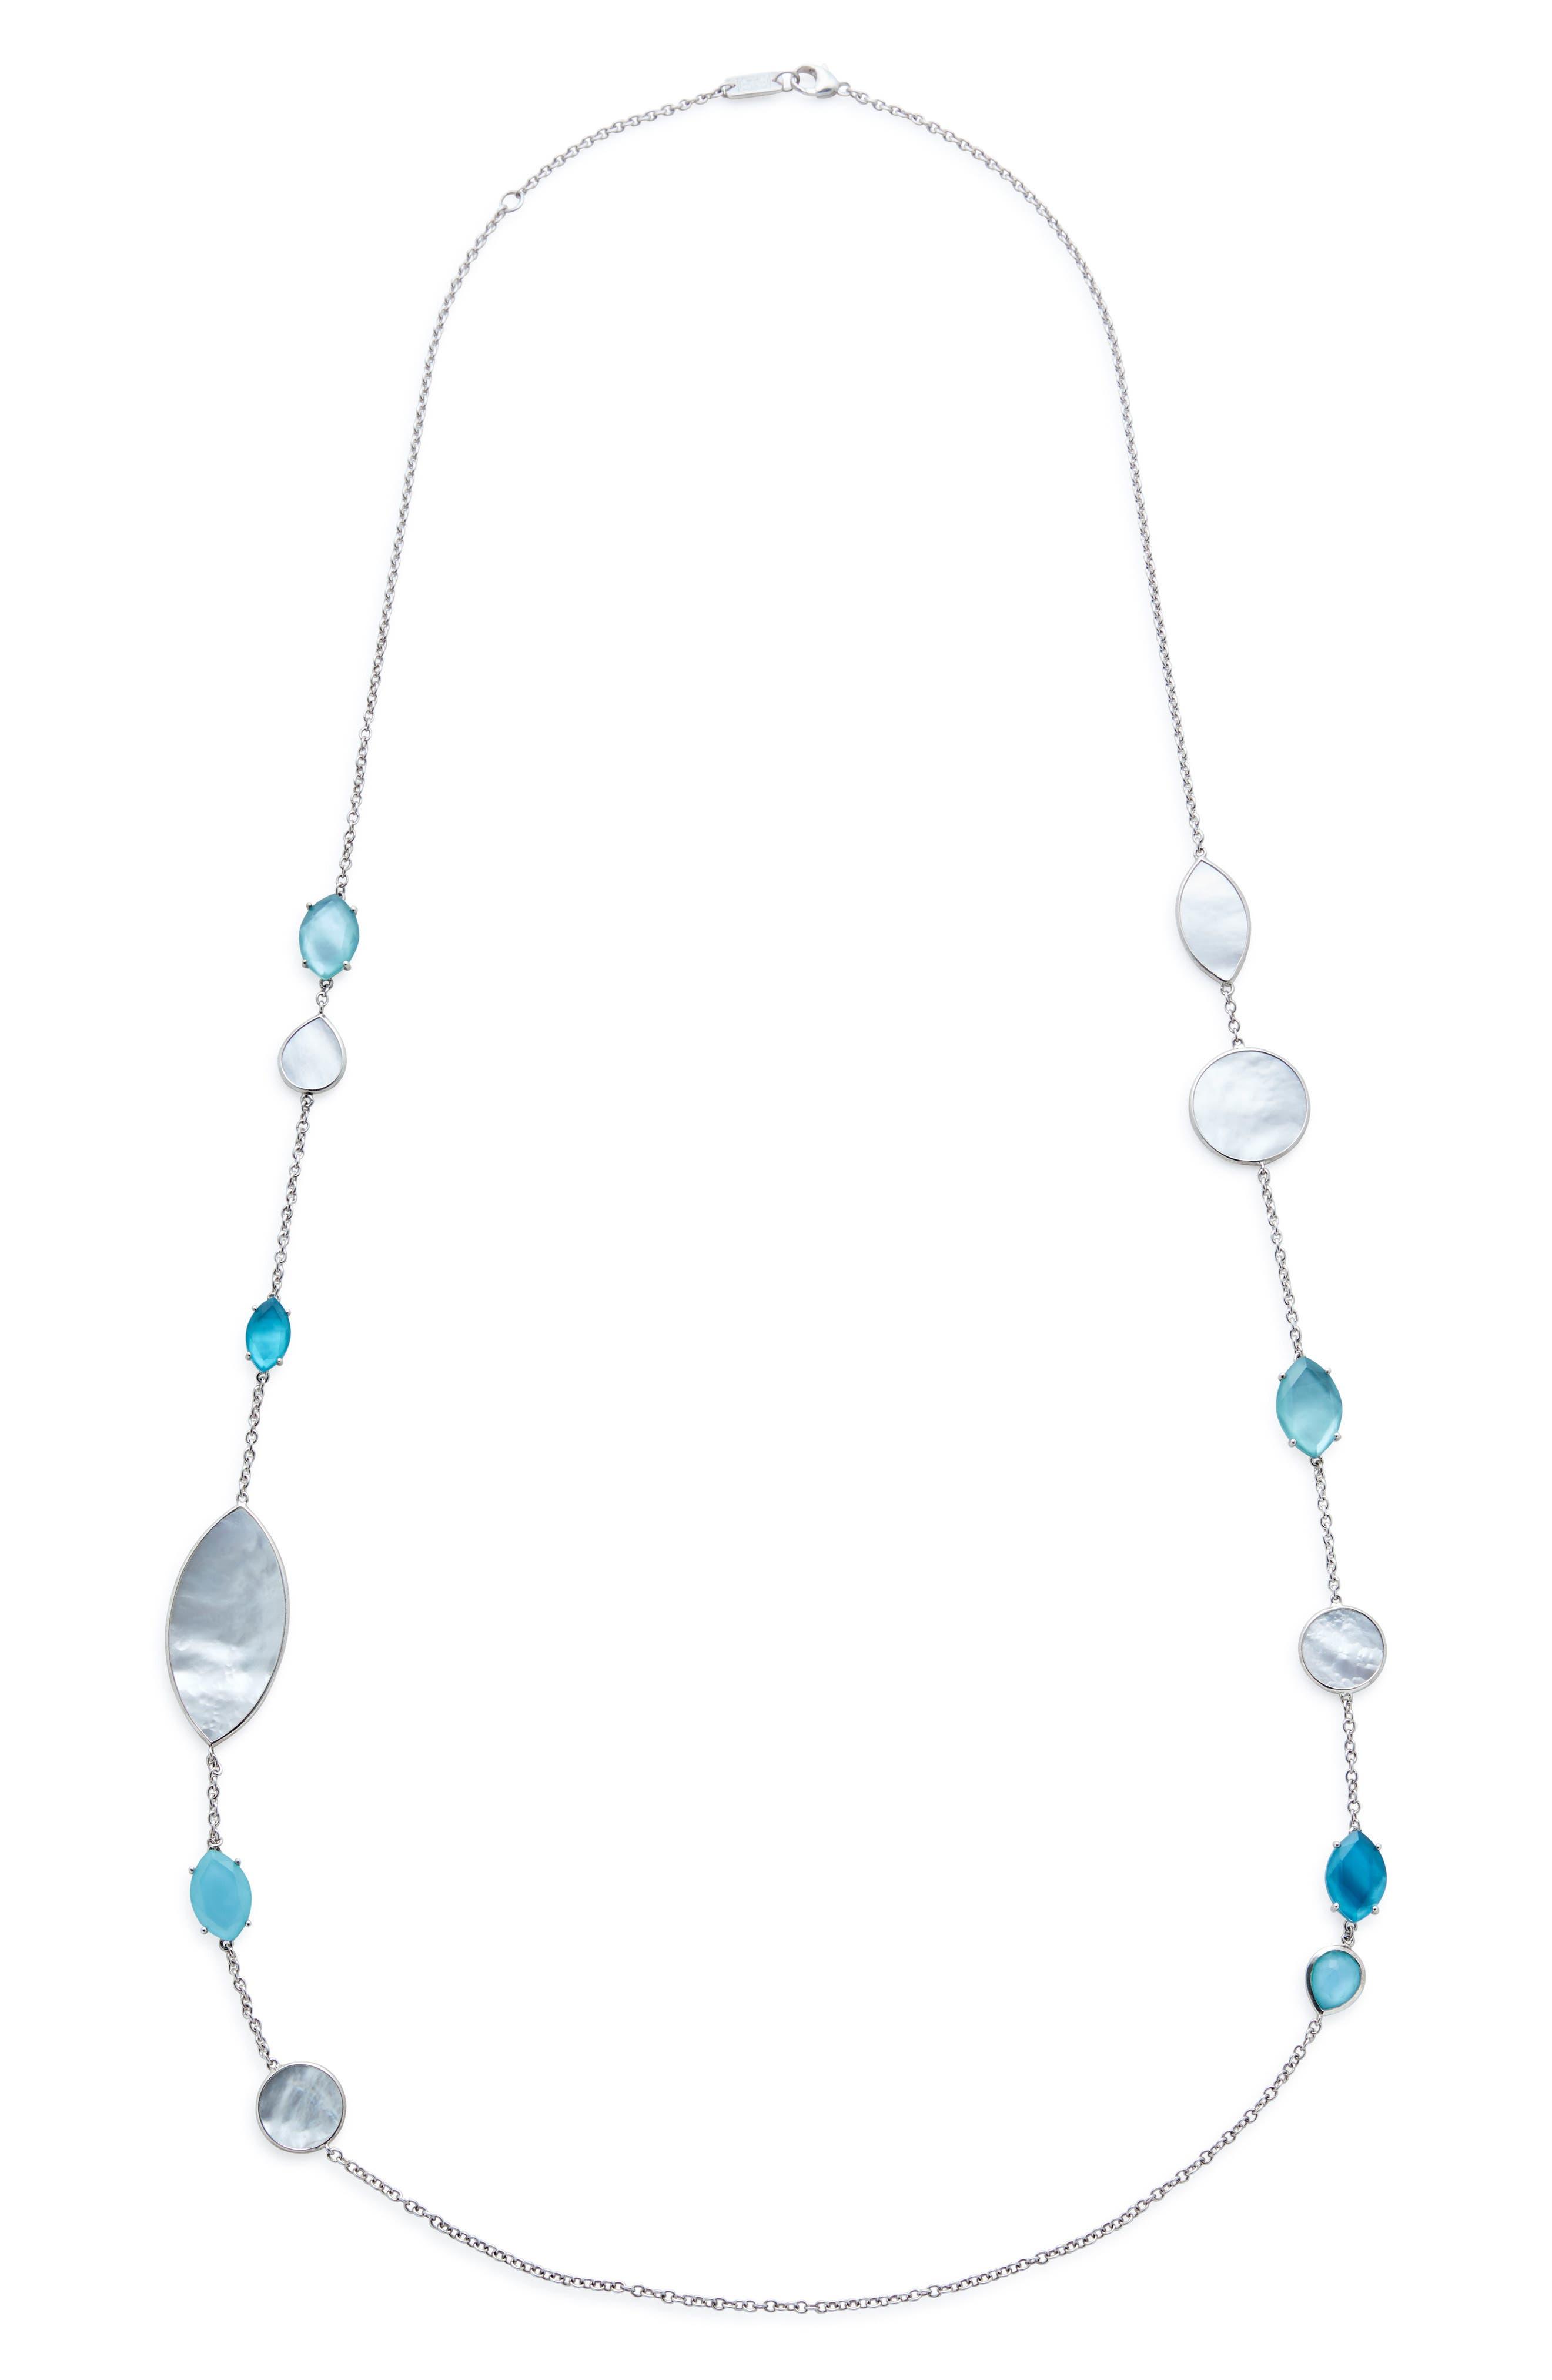 Wonderland Long Marquise Stone Necklace,                             Main thumbnail 1, color,                             BLUE/ MOP